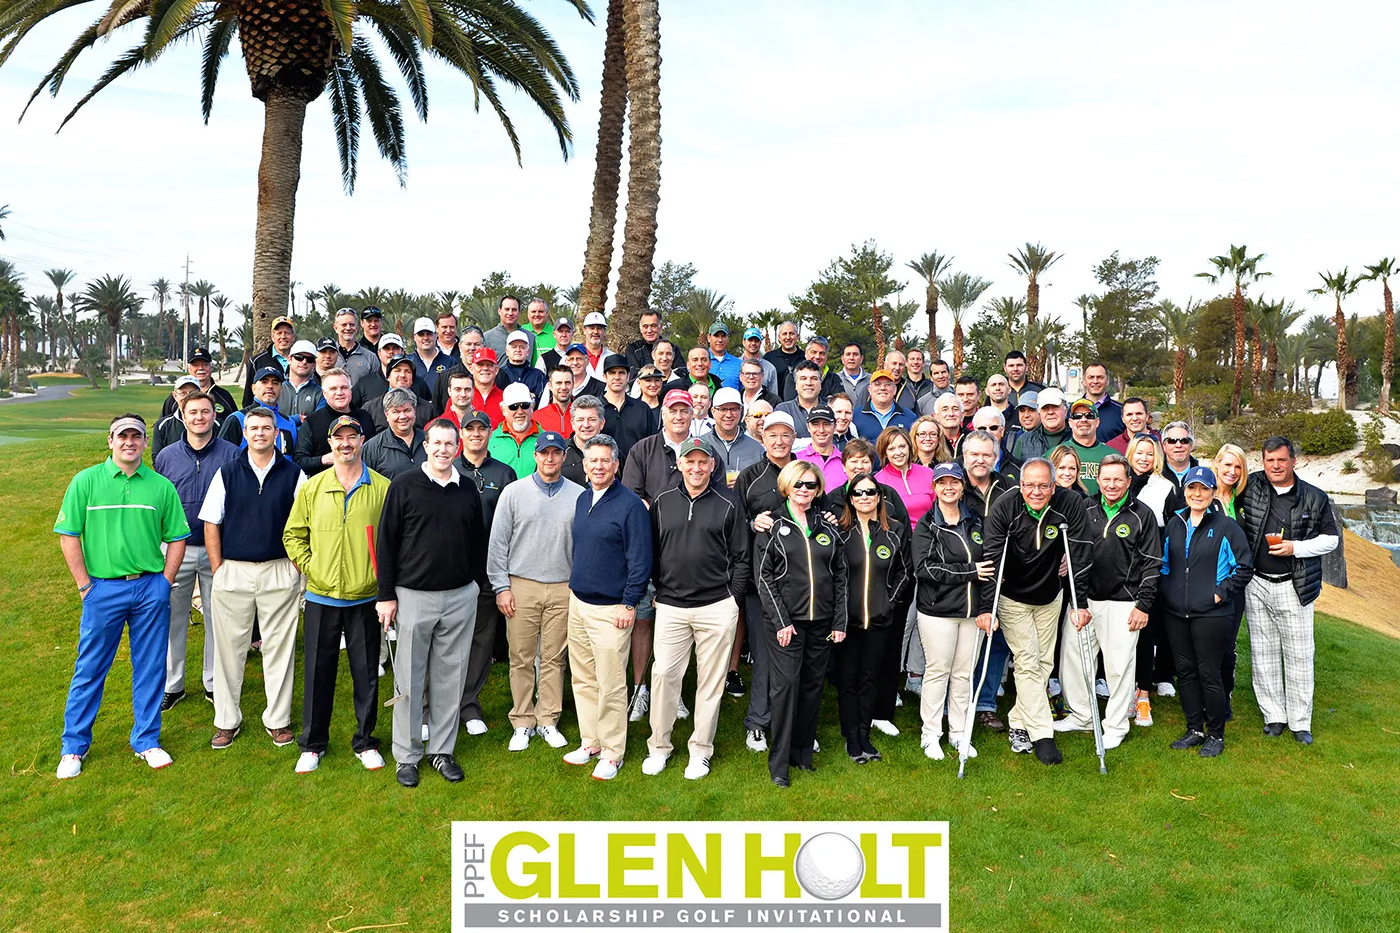 image las vegas golf